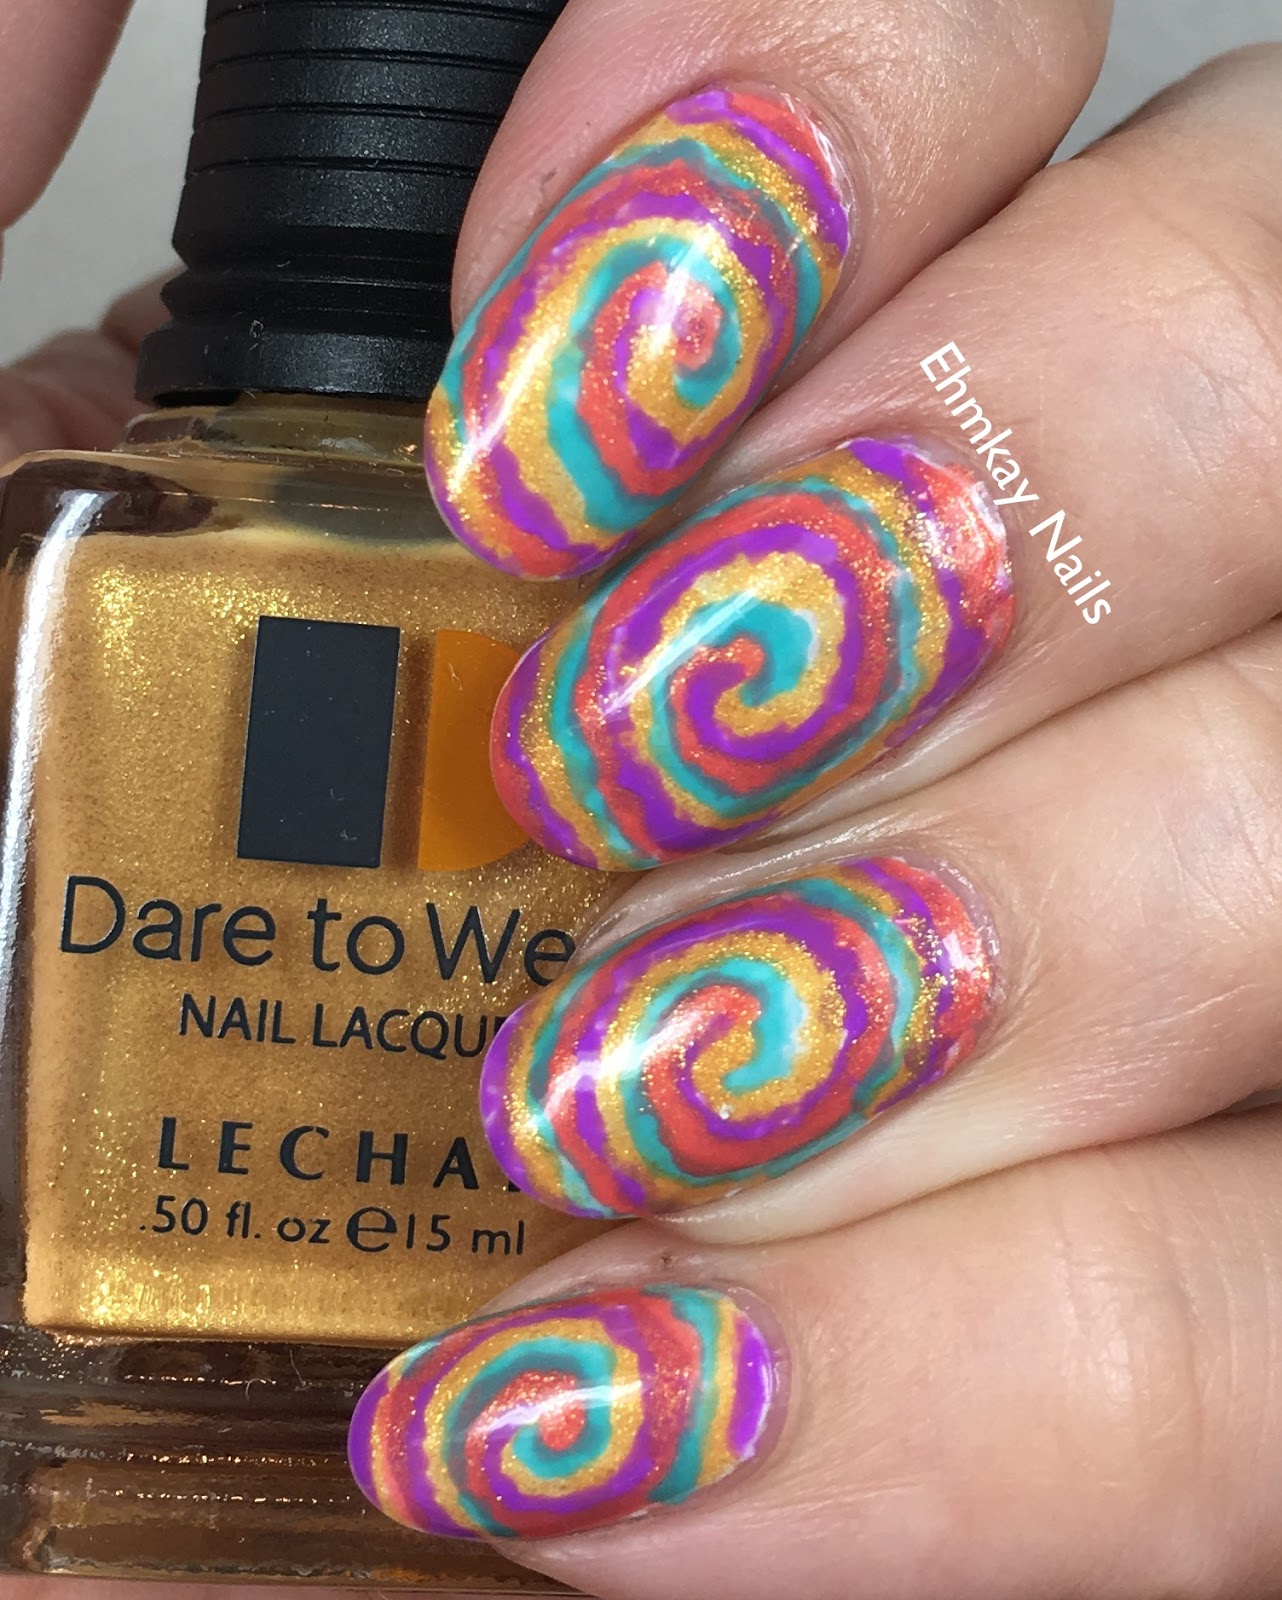 Ehmkay Nails Lechat Dare To Wear Indie Fest Tie Dye Nail Art